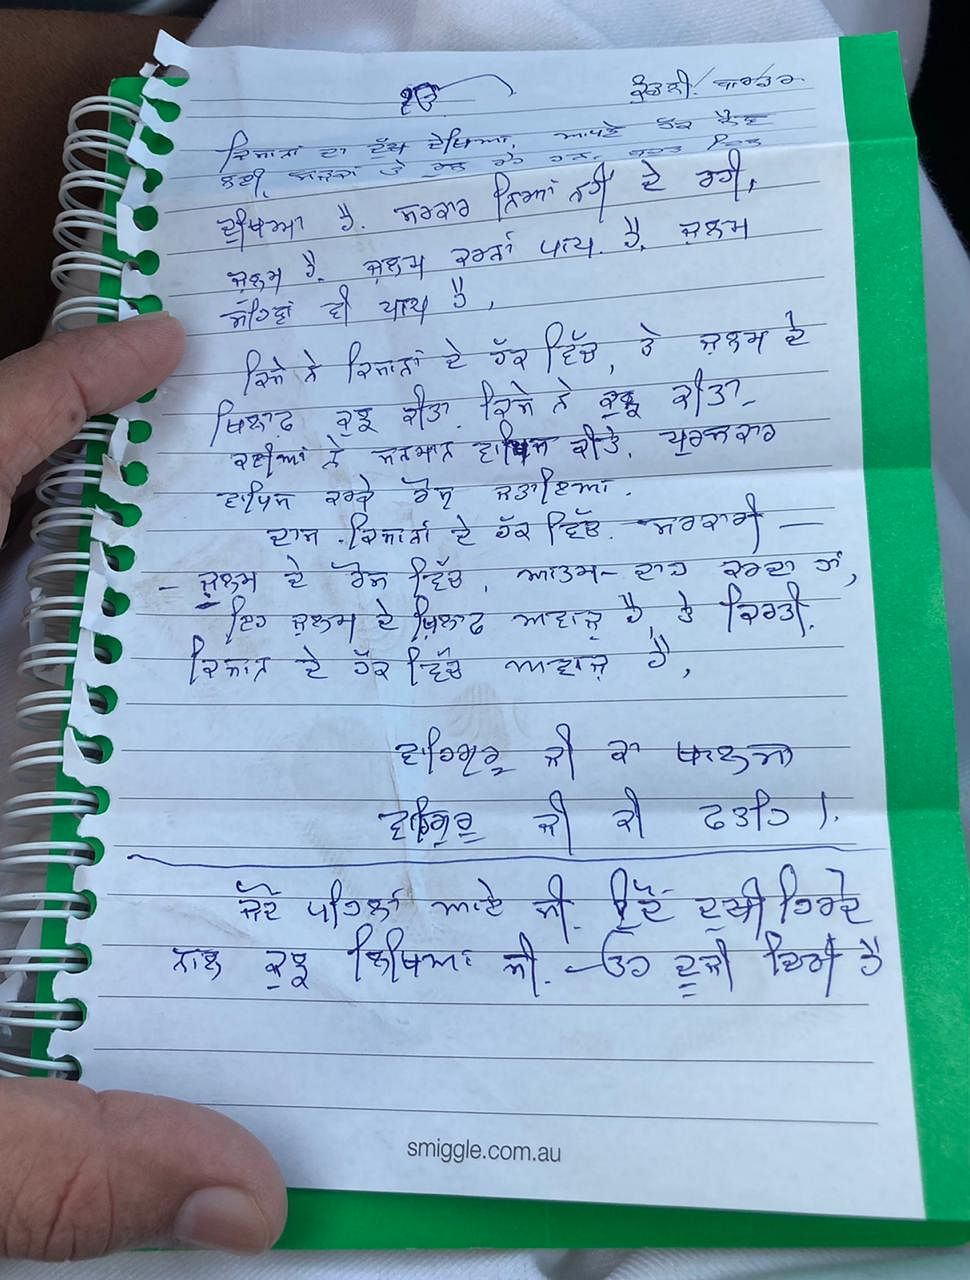 Baba Ram Singh's note.